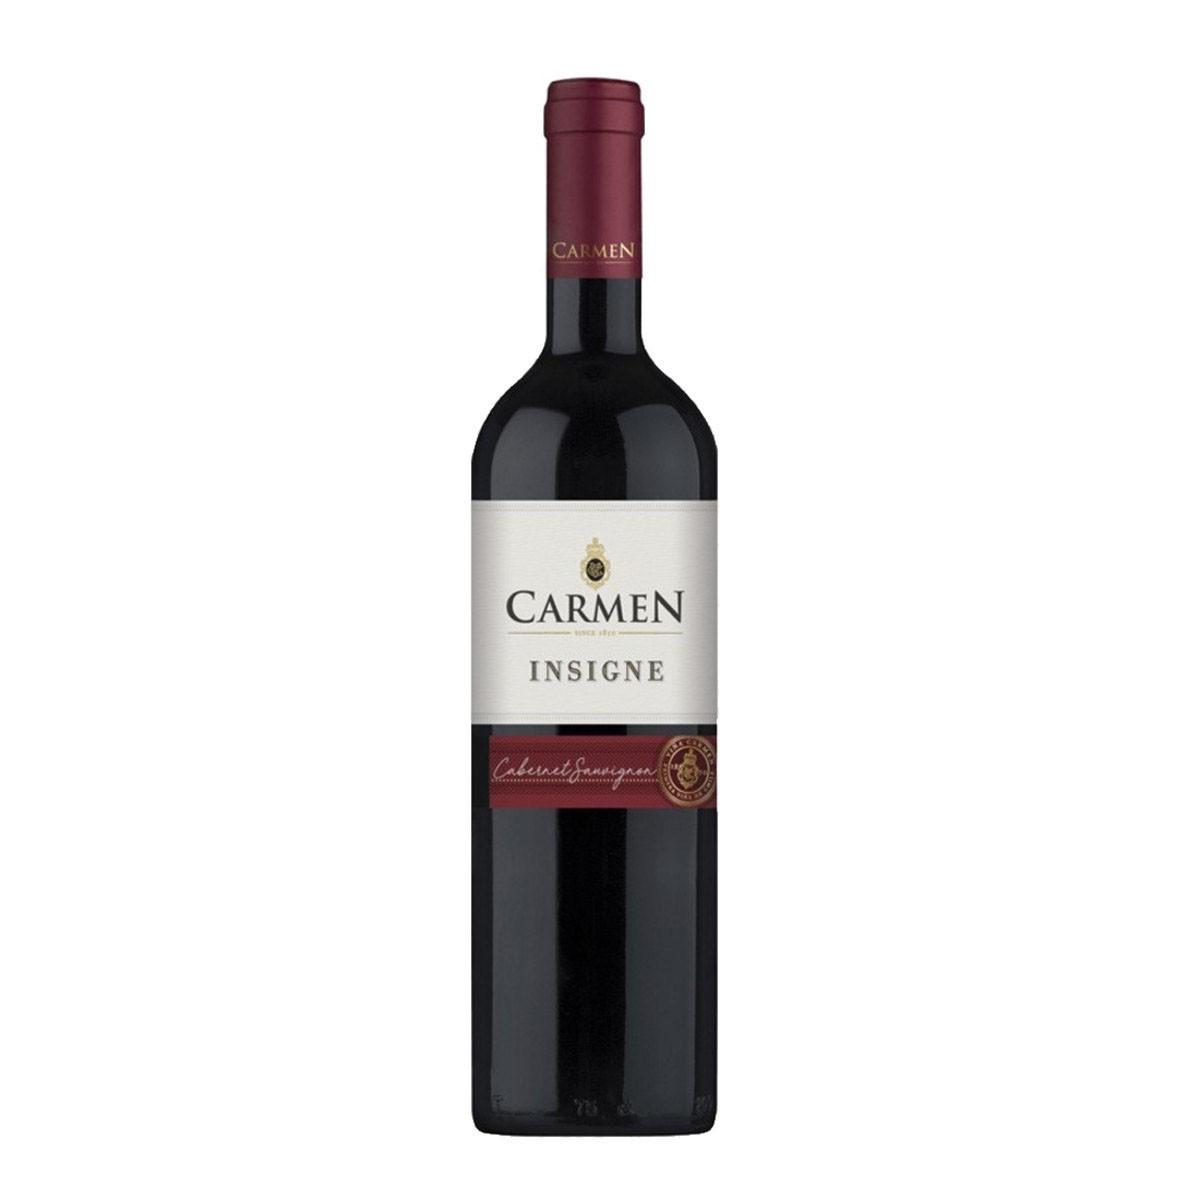 Vinho Tinto Chileno Carmen Insigne Cabernet Sauvignon 2018